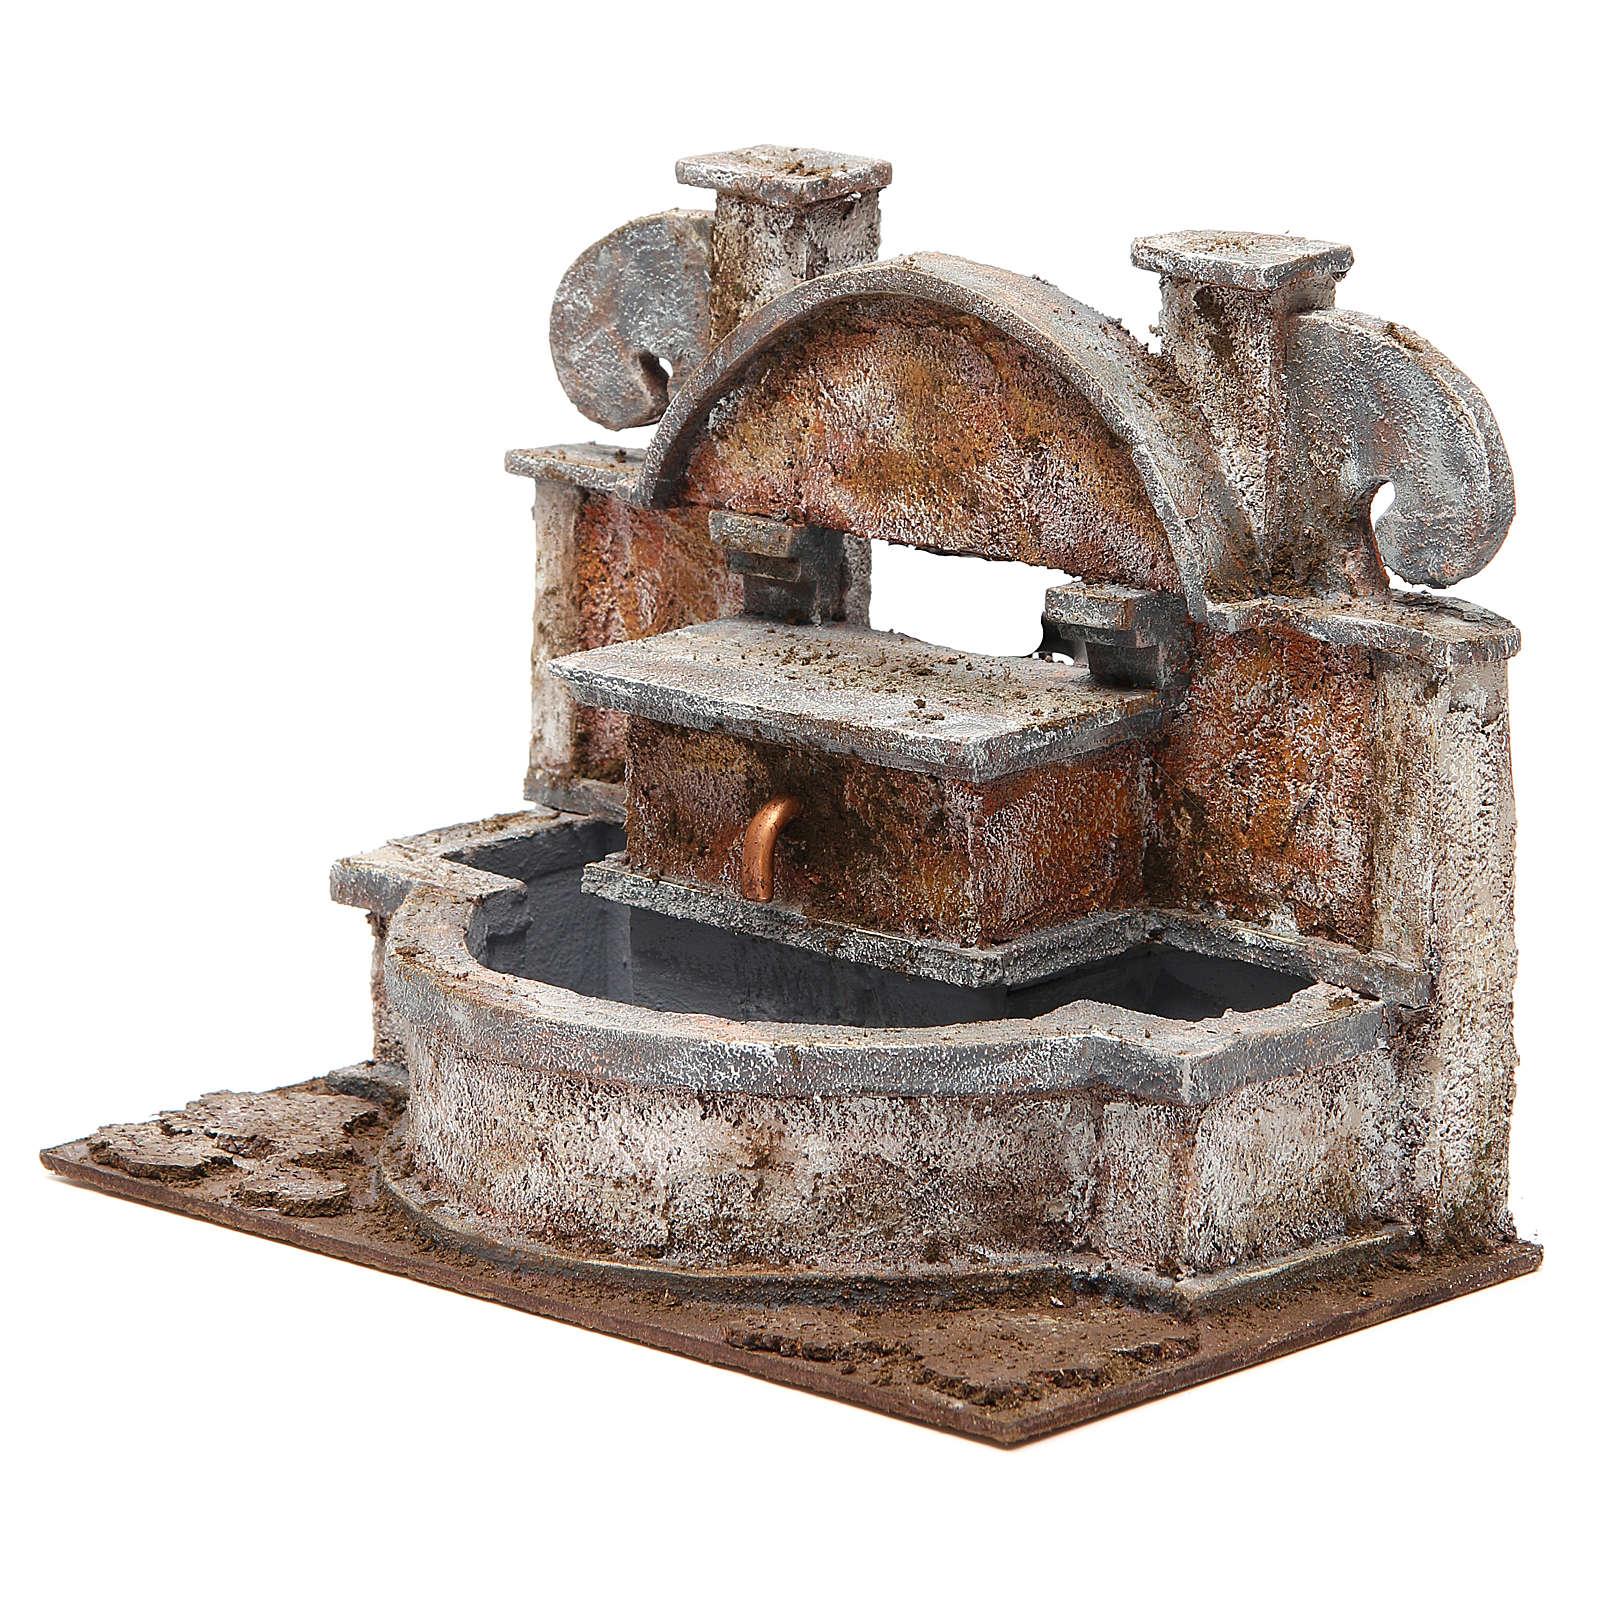 Fontana presepe rustica con grande vasca 20x25x15 cm 4